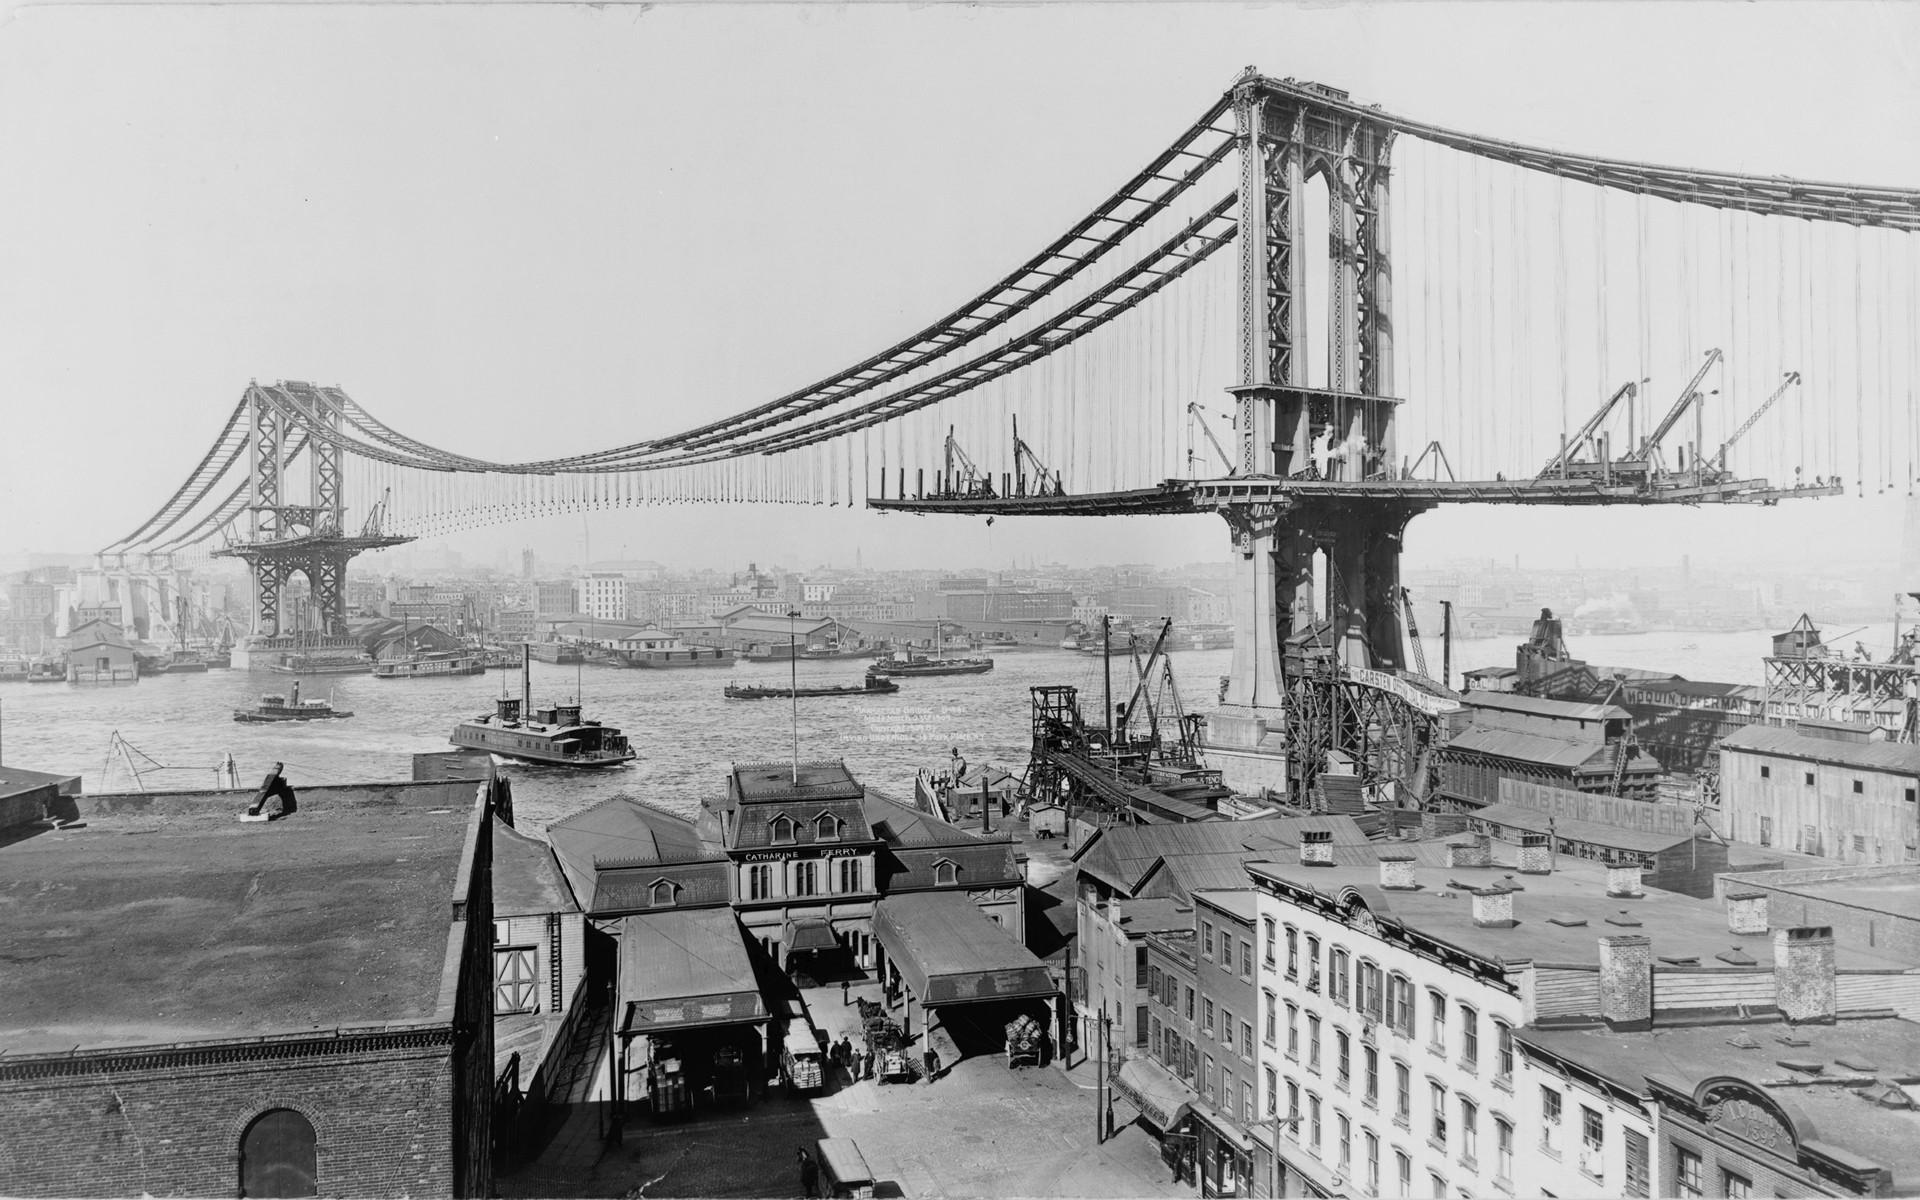 The Brooklyn Bridge under construction, ca. 1880